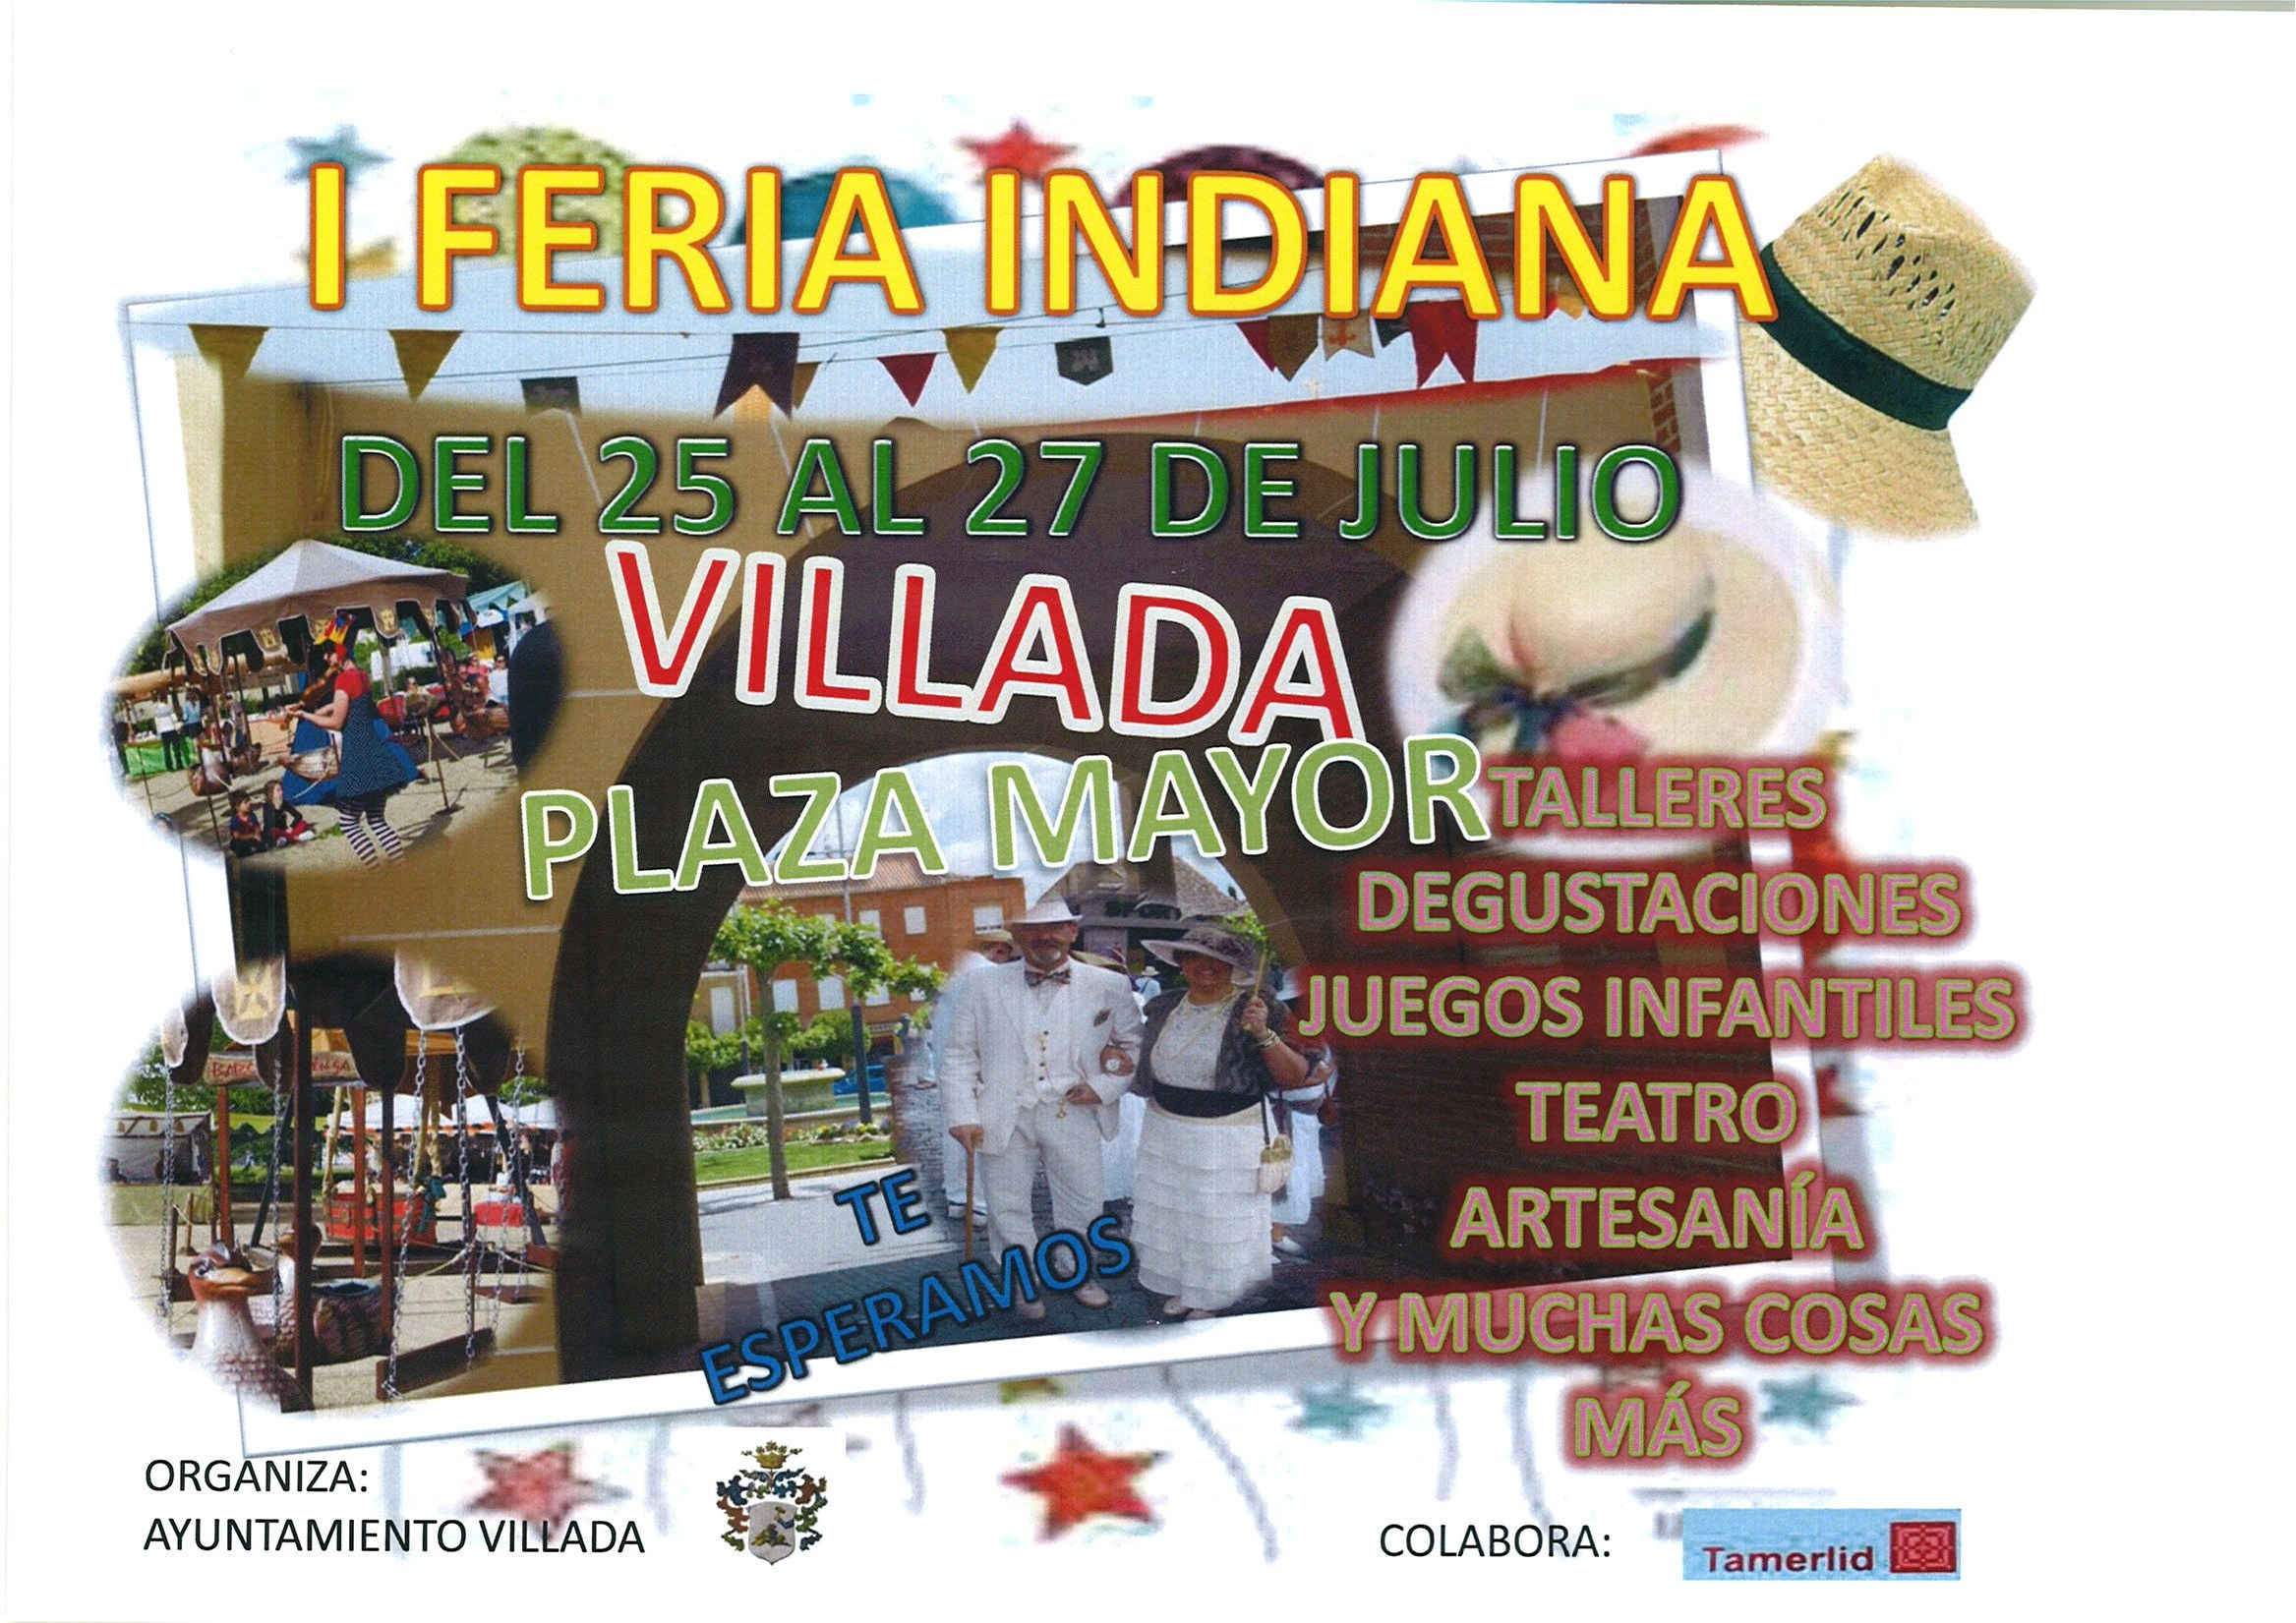 I Feria Indiana. 25 al 27 de Julio.